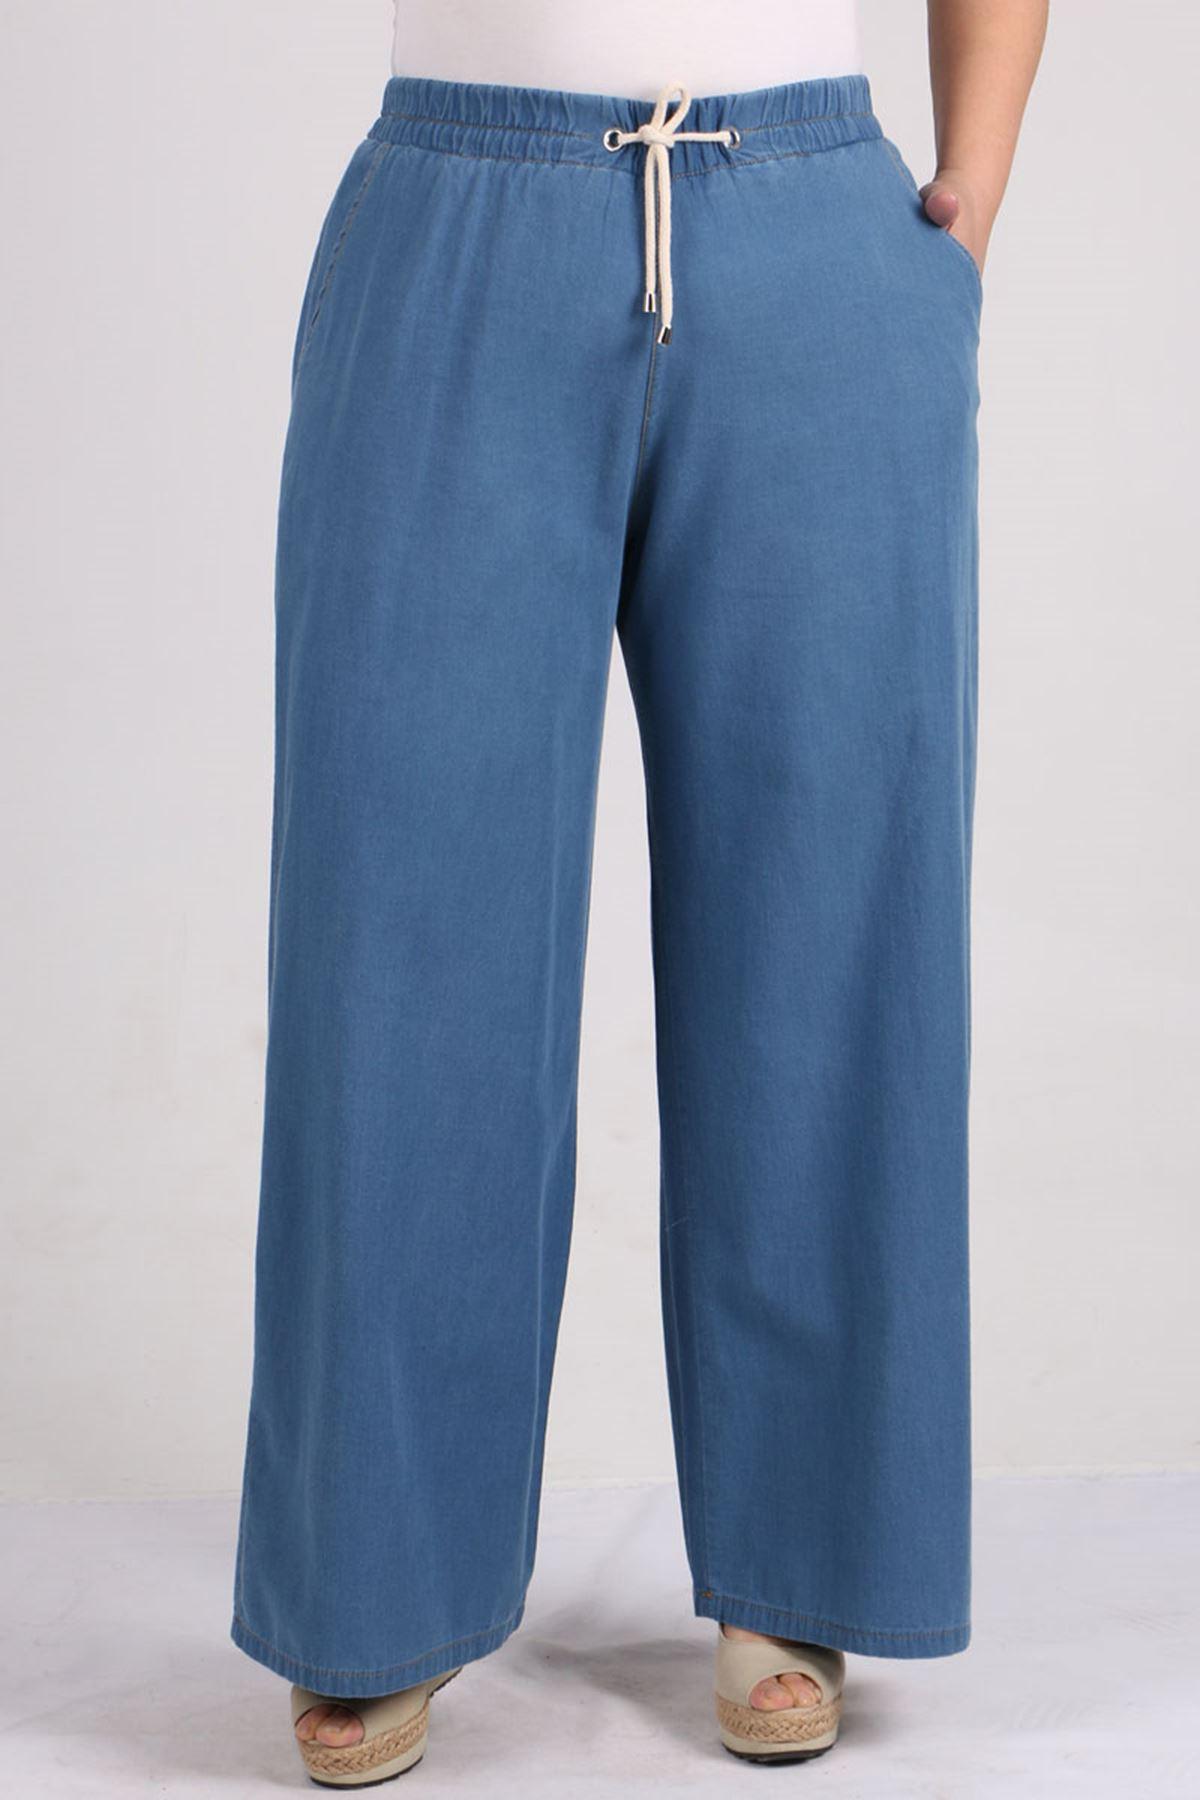 9155 Büyük Beden Beli Lastikli Bol Paça Kot Pantolon - Açık Mavi